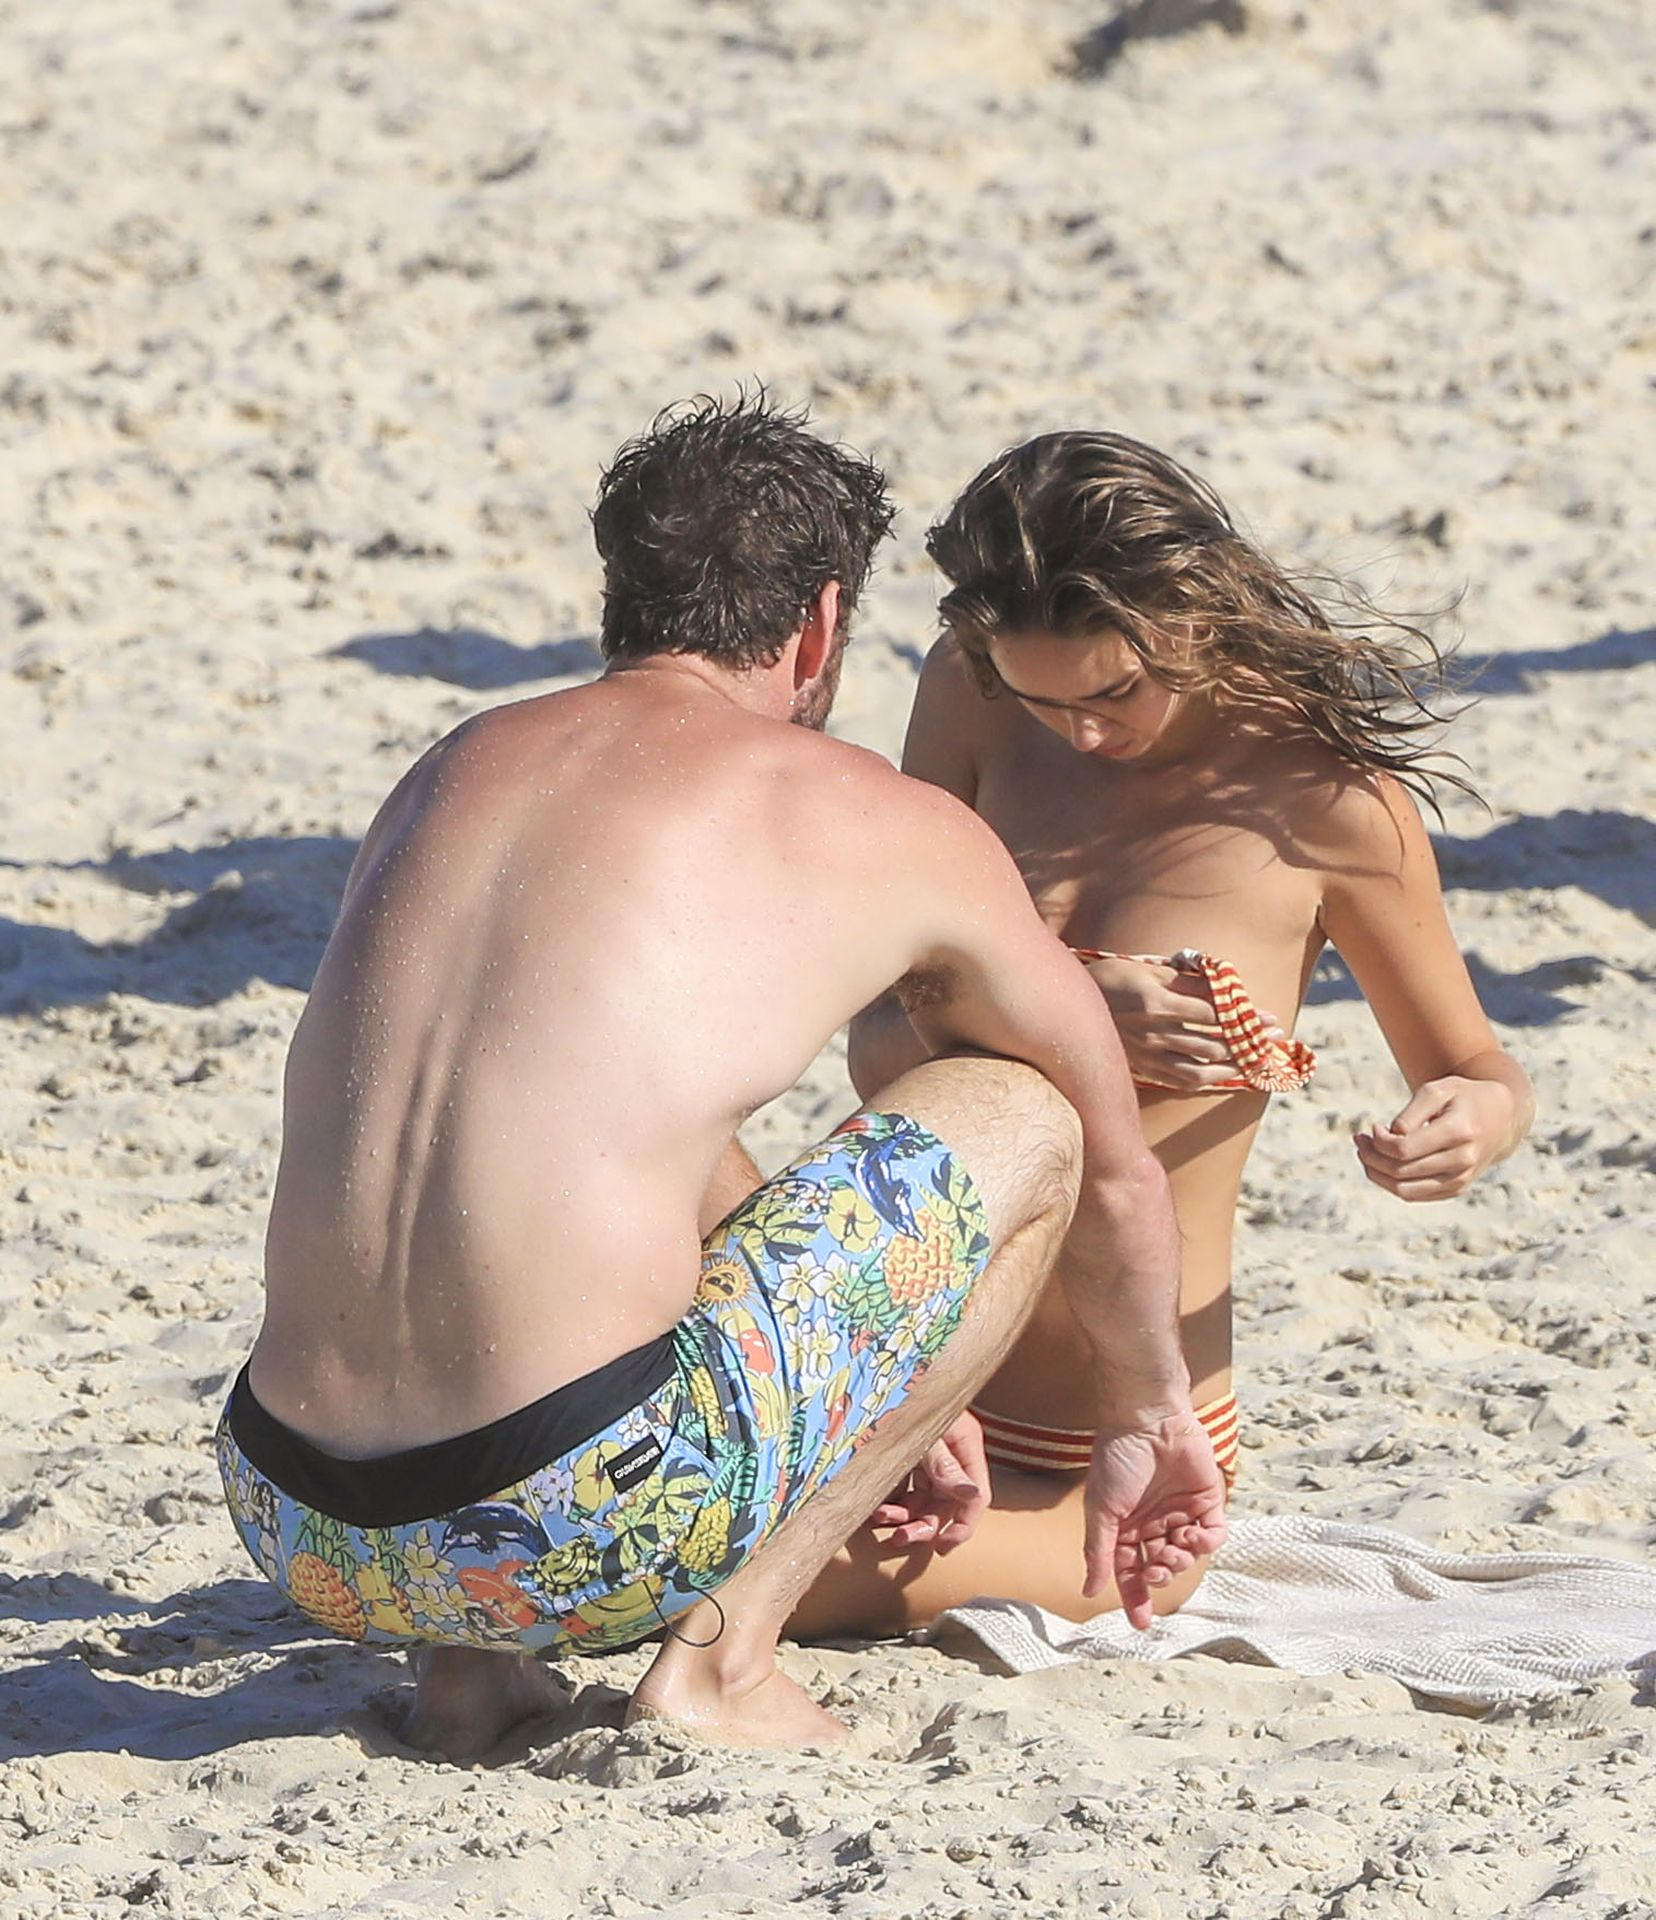 Gabriella Brooks Hot – Liam Hemsworth's New Girlfriend 0015